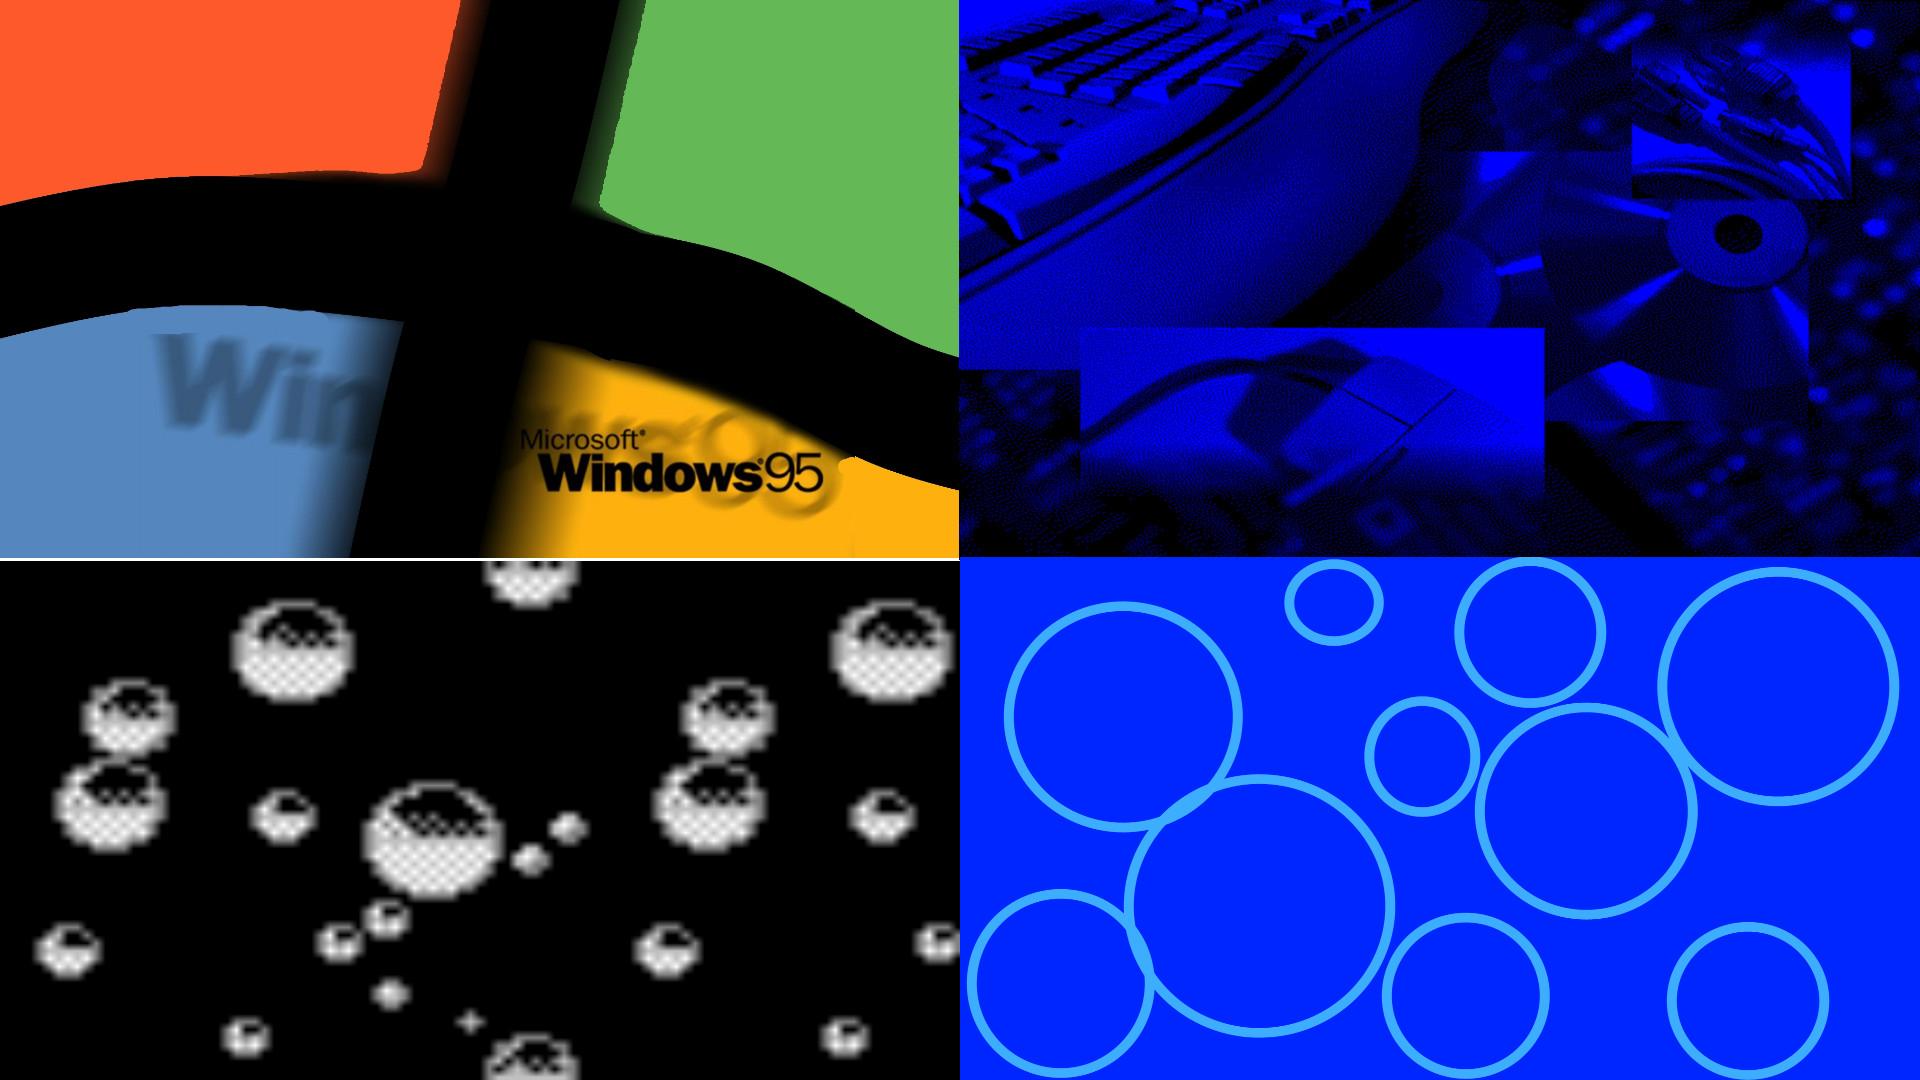 Windows 95 Wallpaper Pack 54 Images